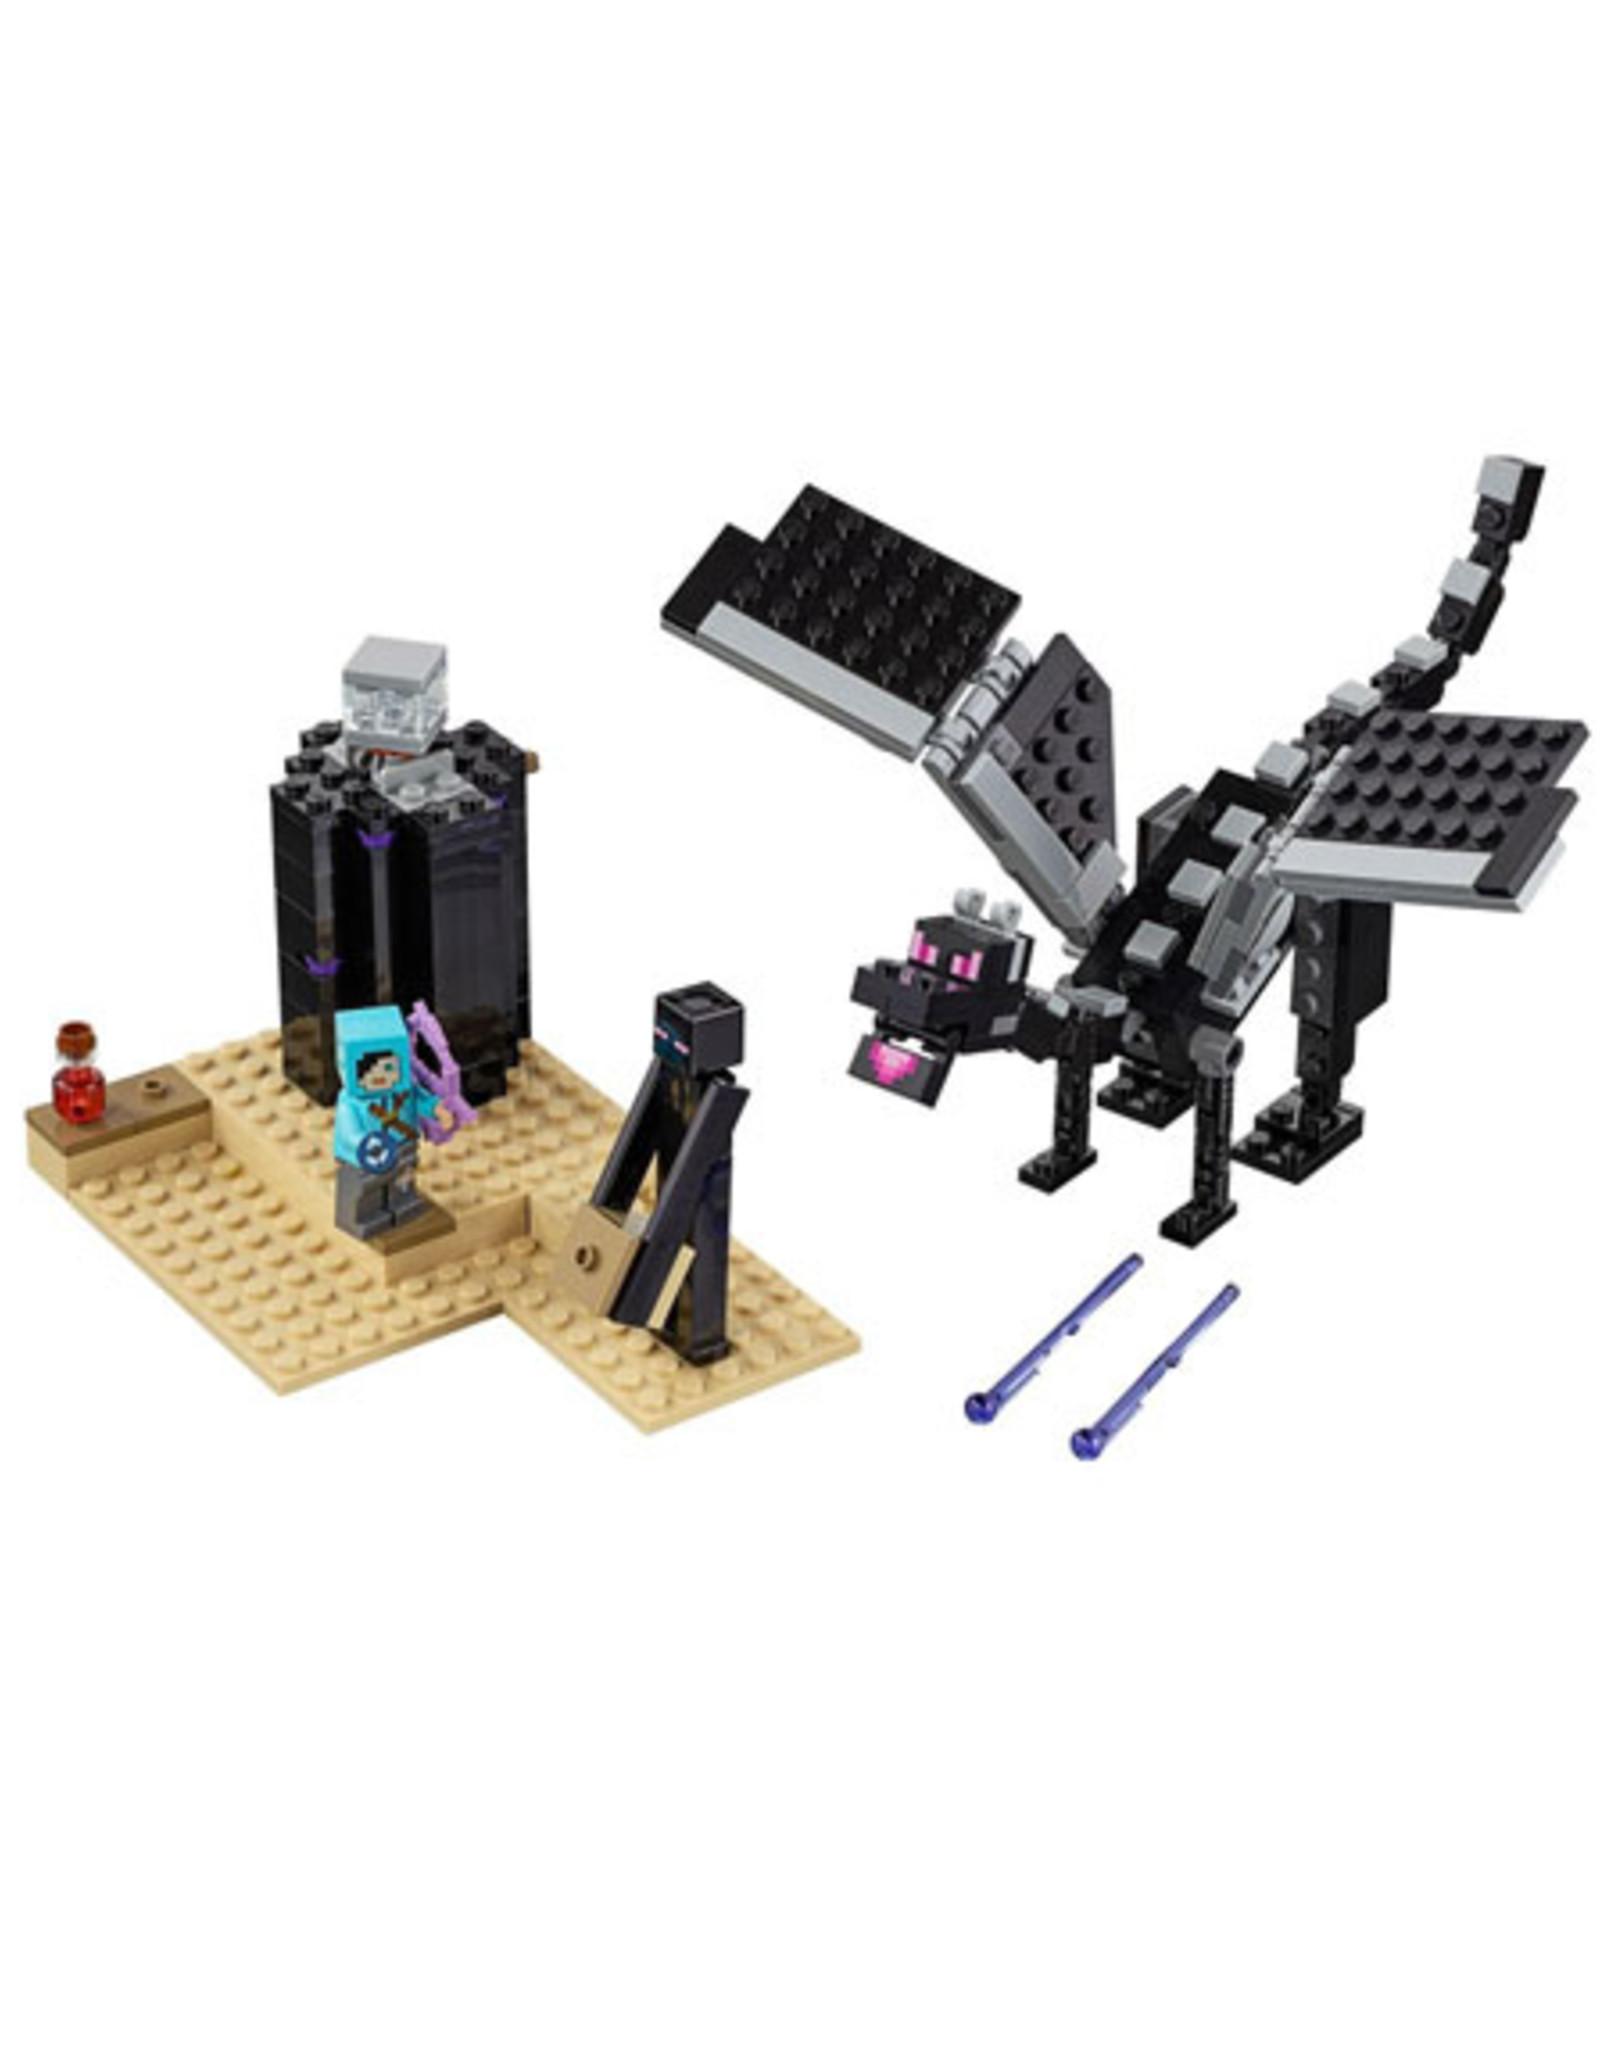 LEGO LEGO 21151 The End Battle MINECRAFT